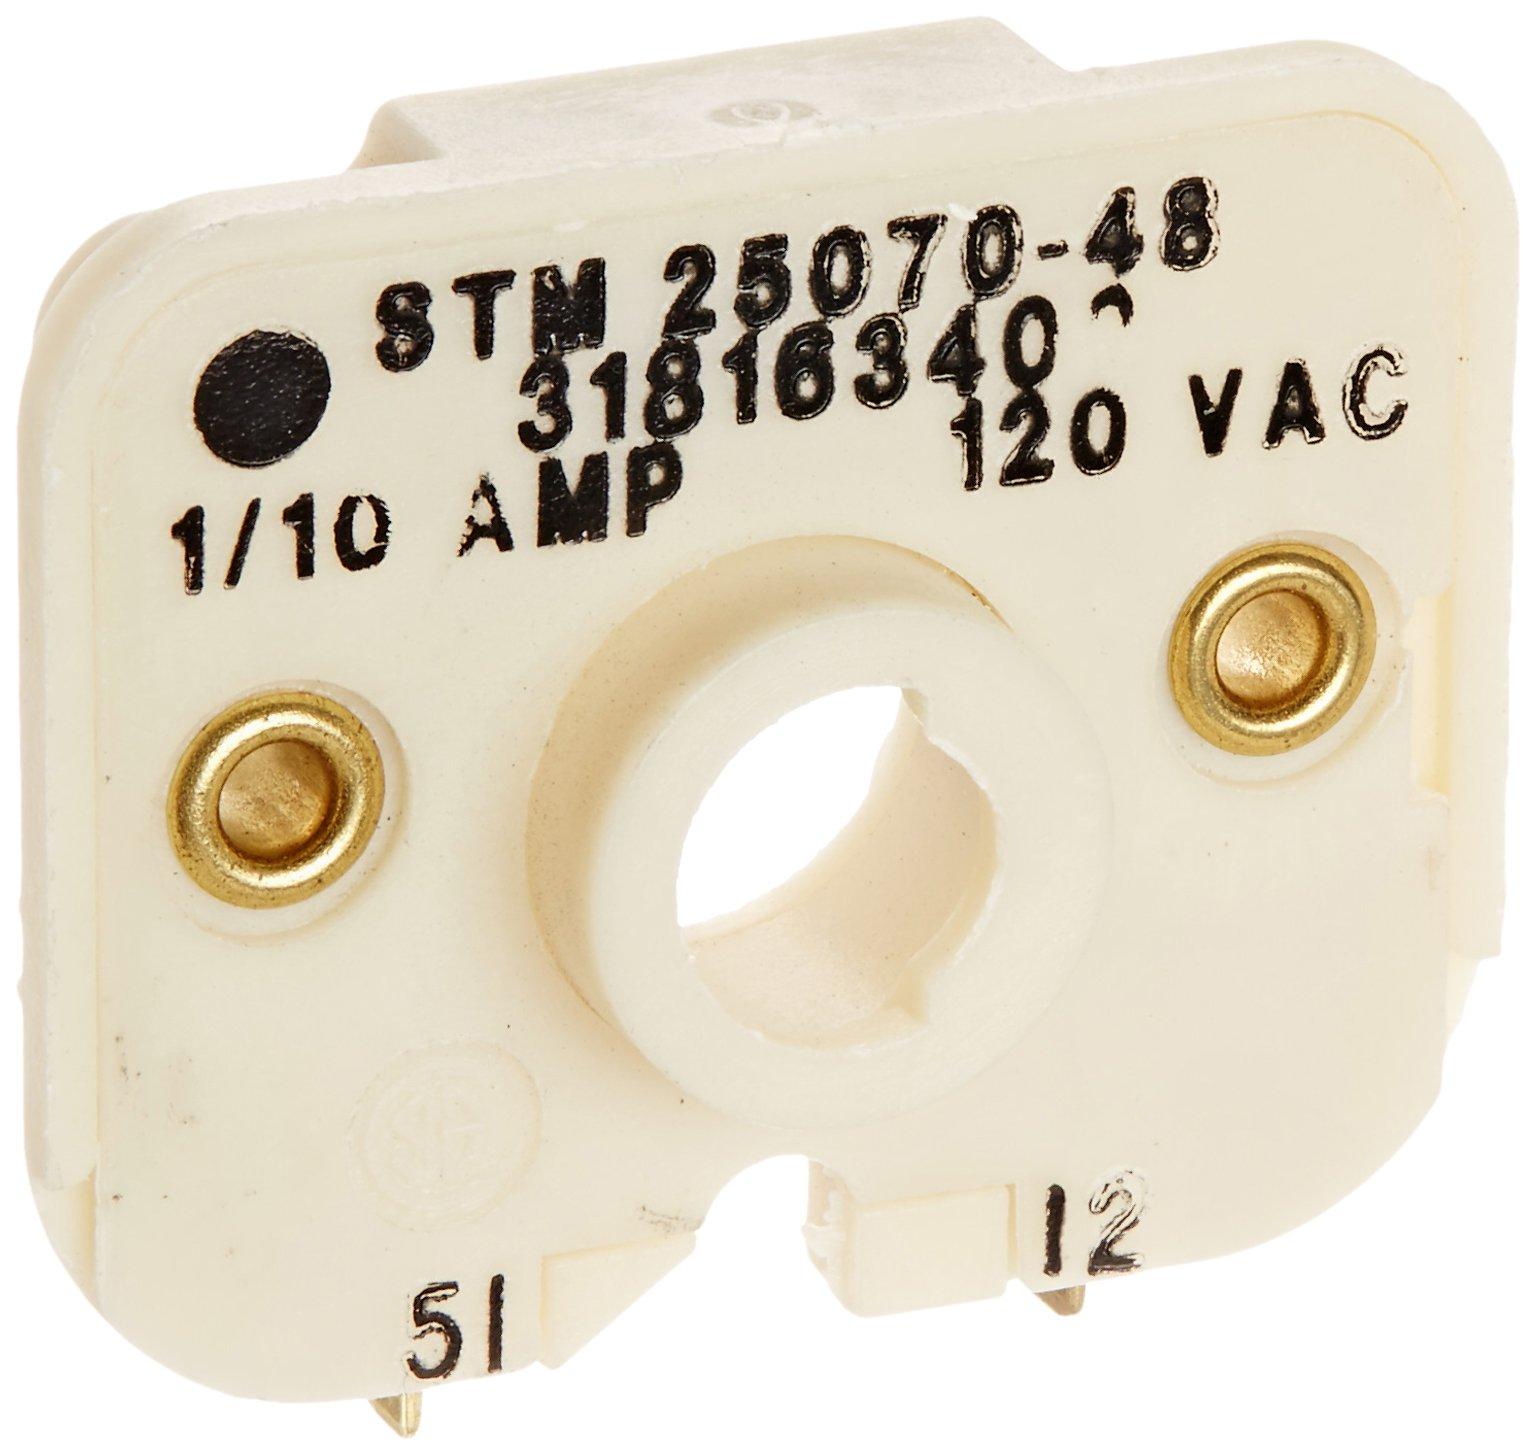 Frigidaire Series 318163400 Switch